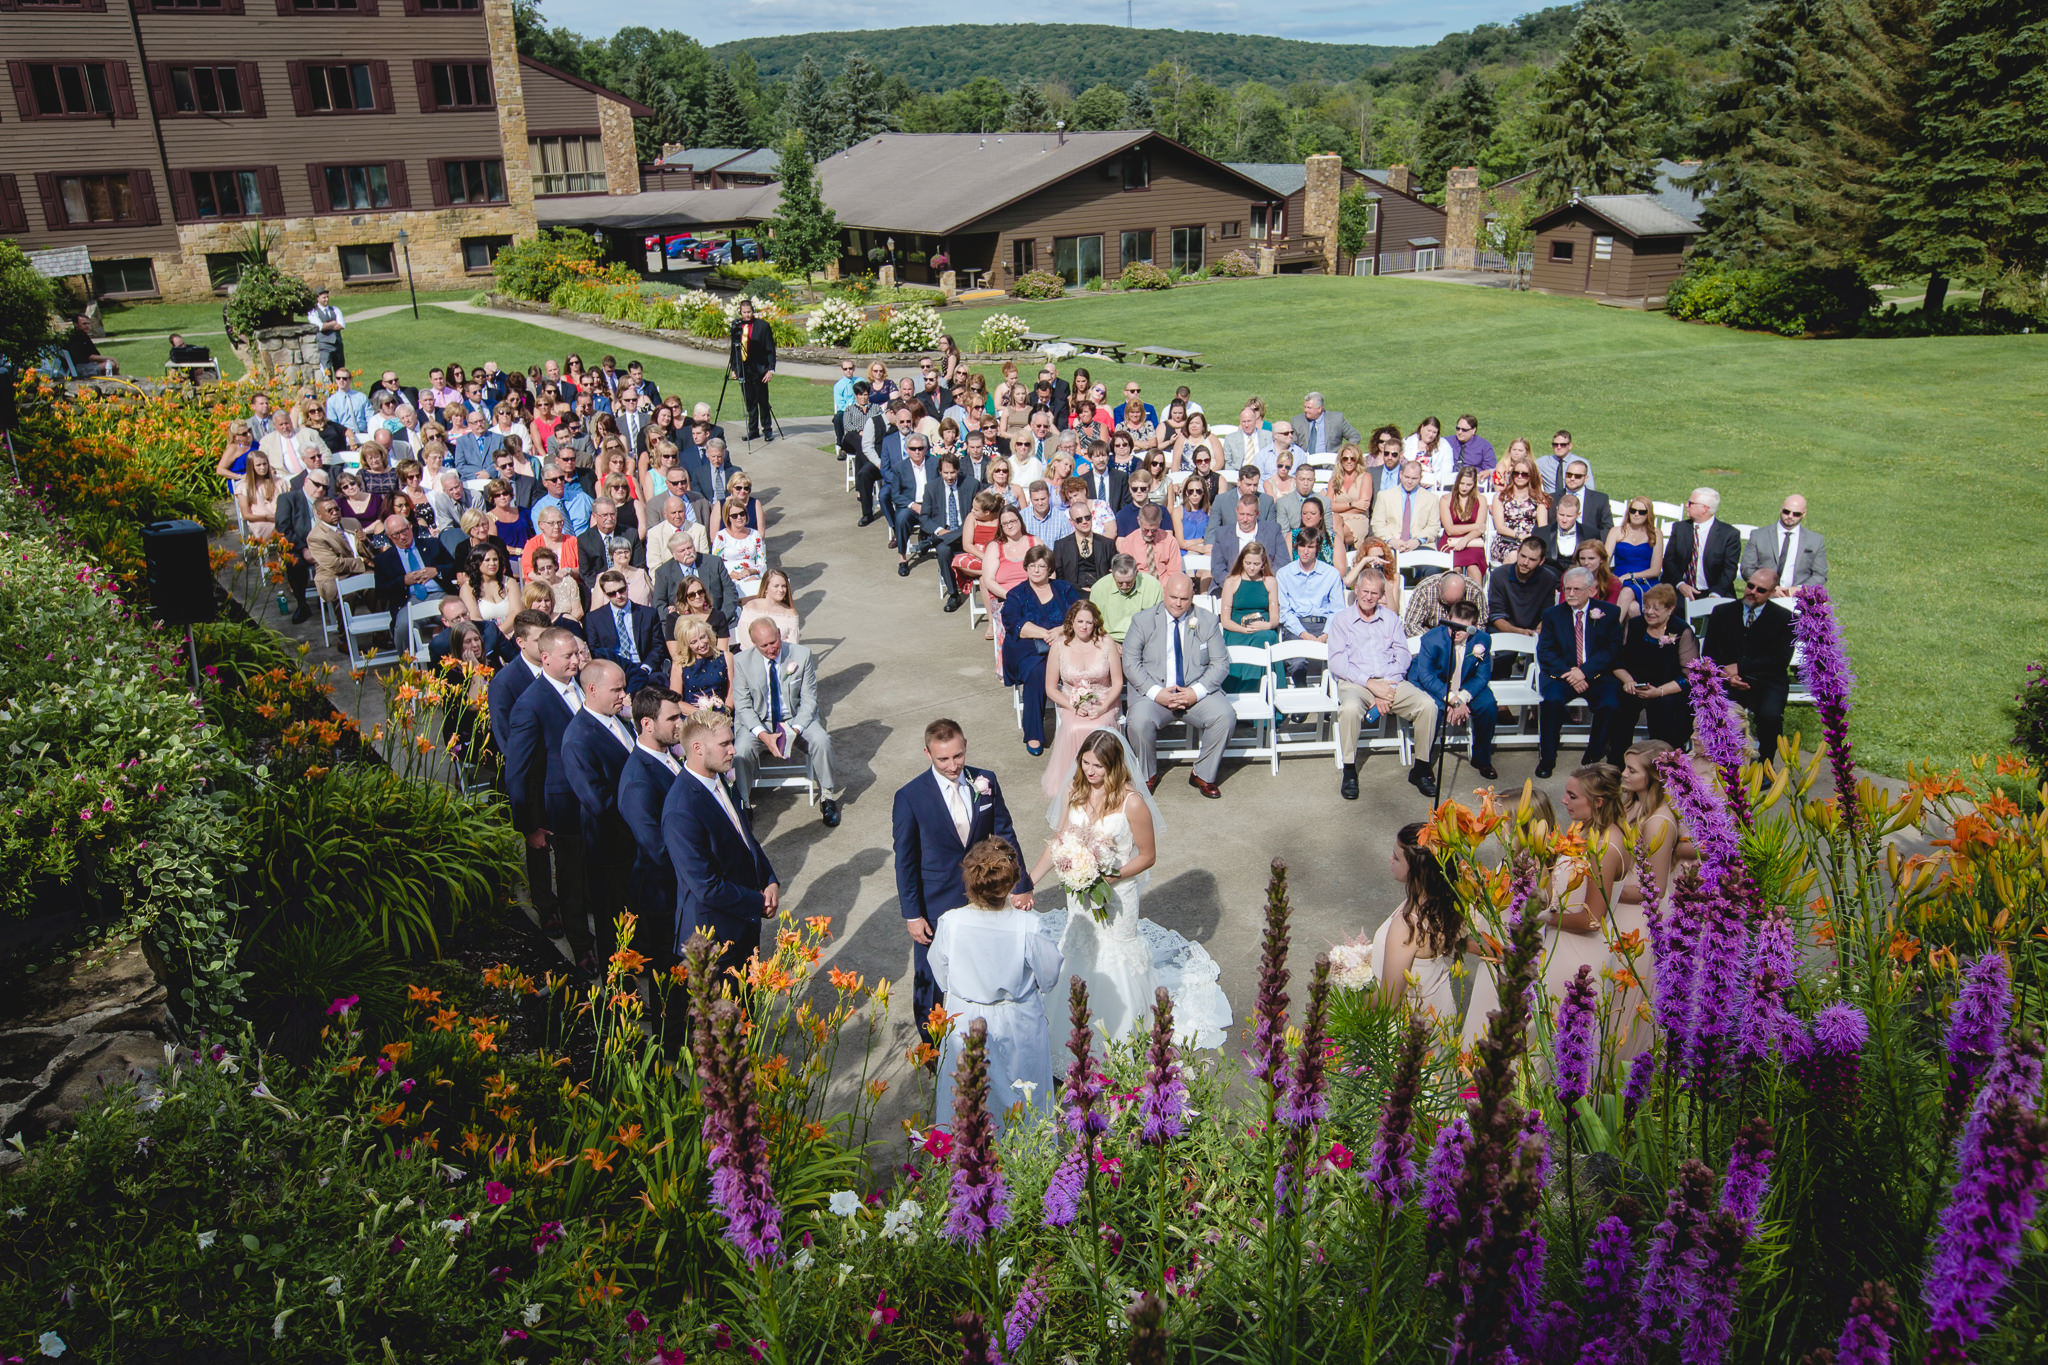 Aerial view of an outdoor wedding ceremony at Hidden Valley Resort